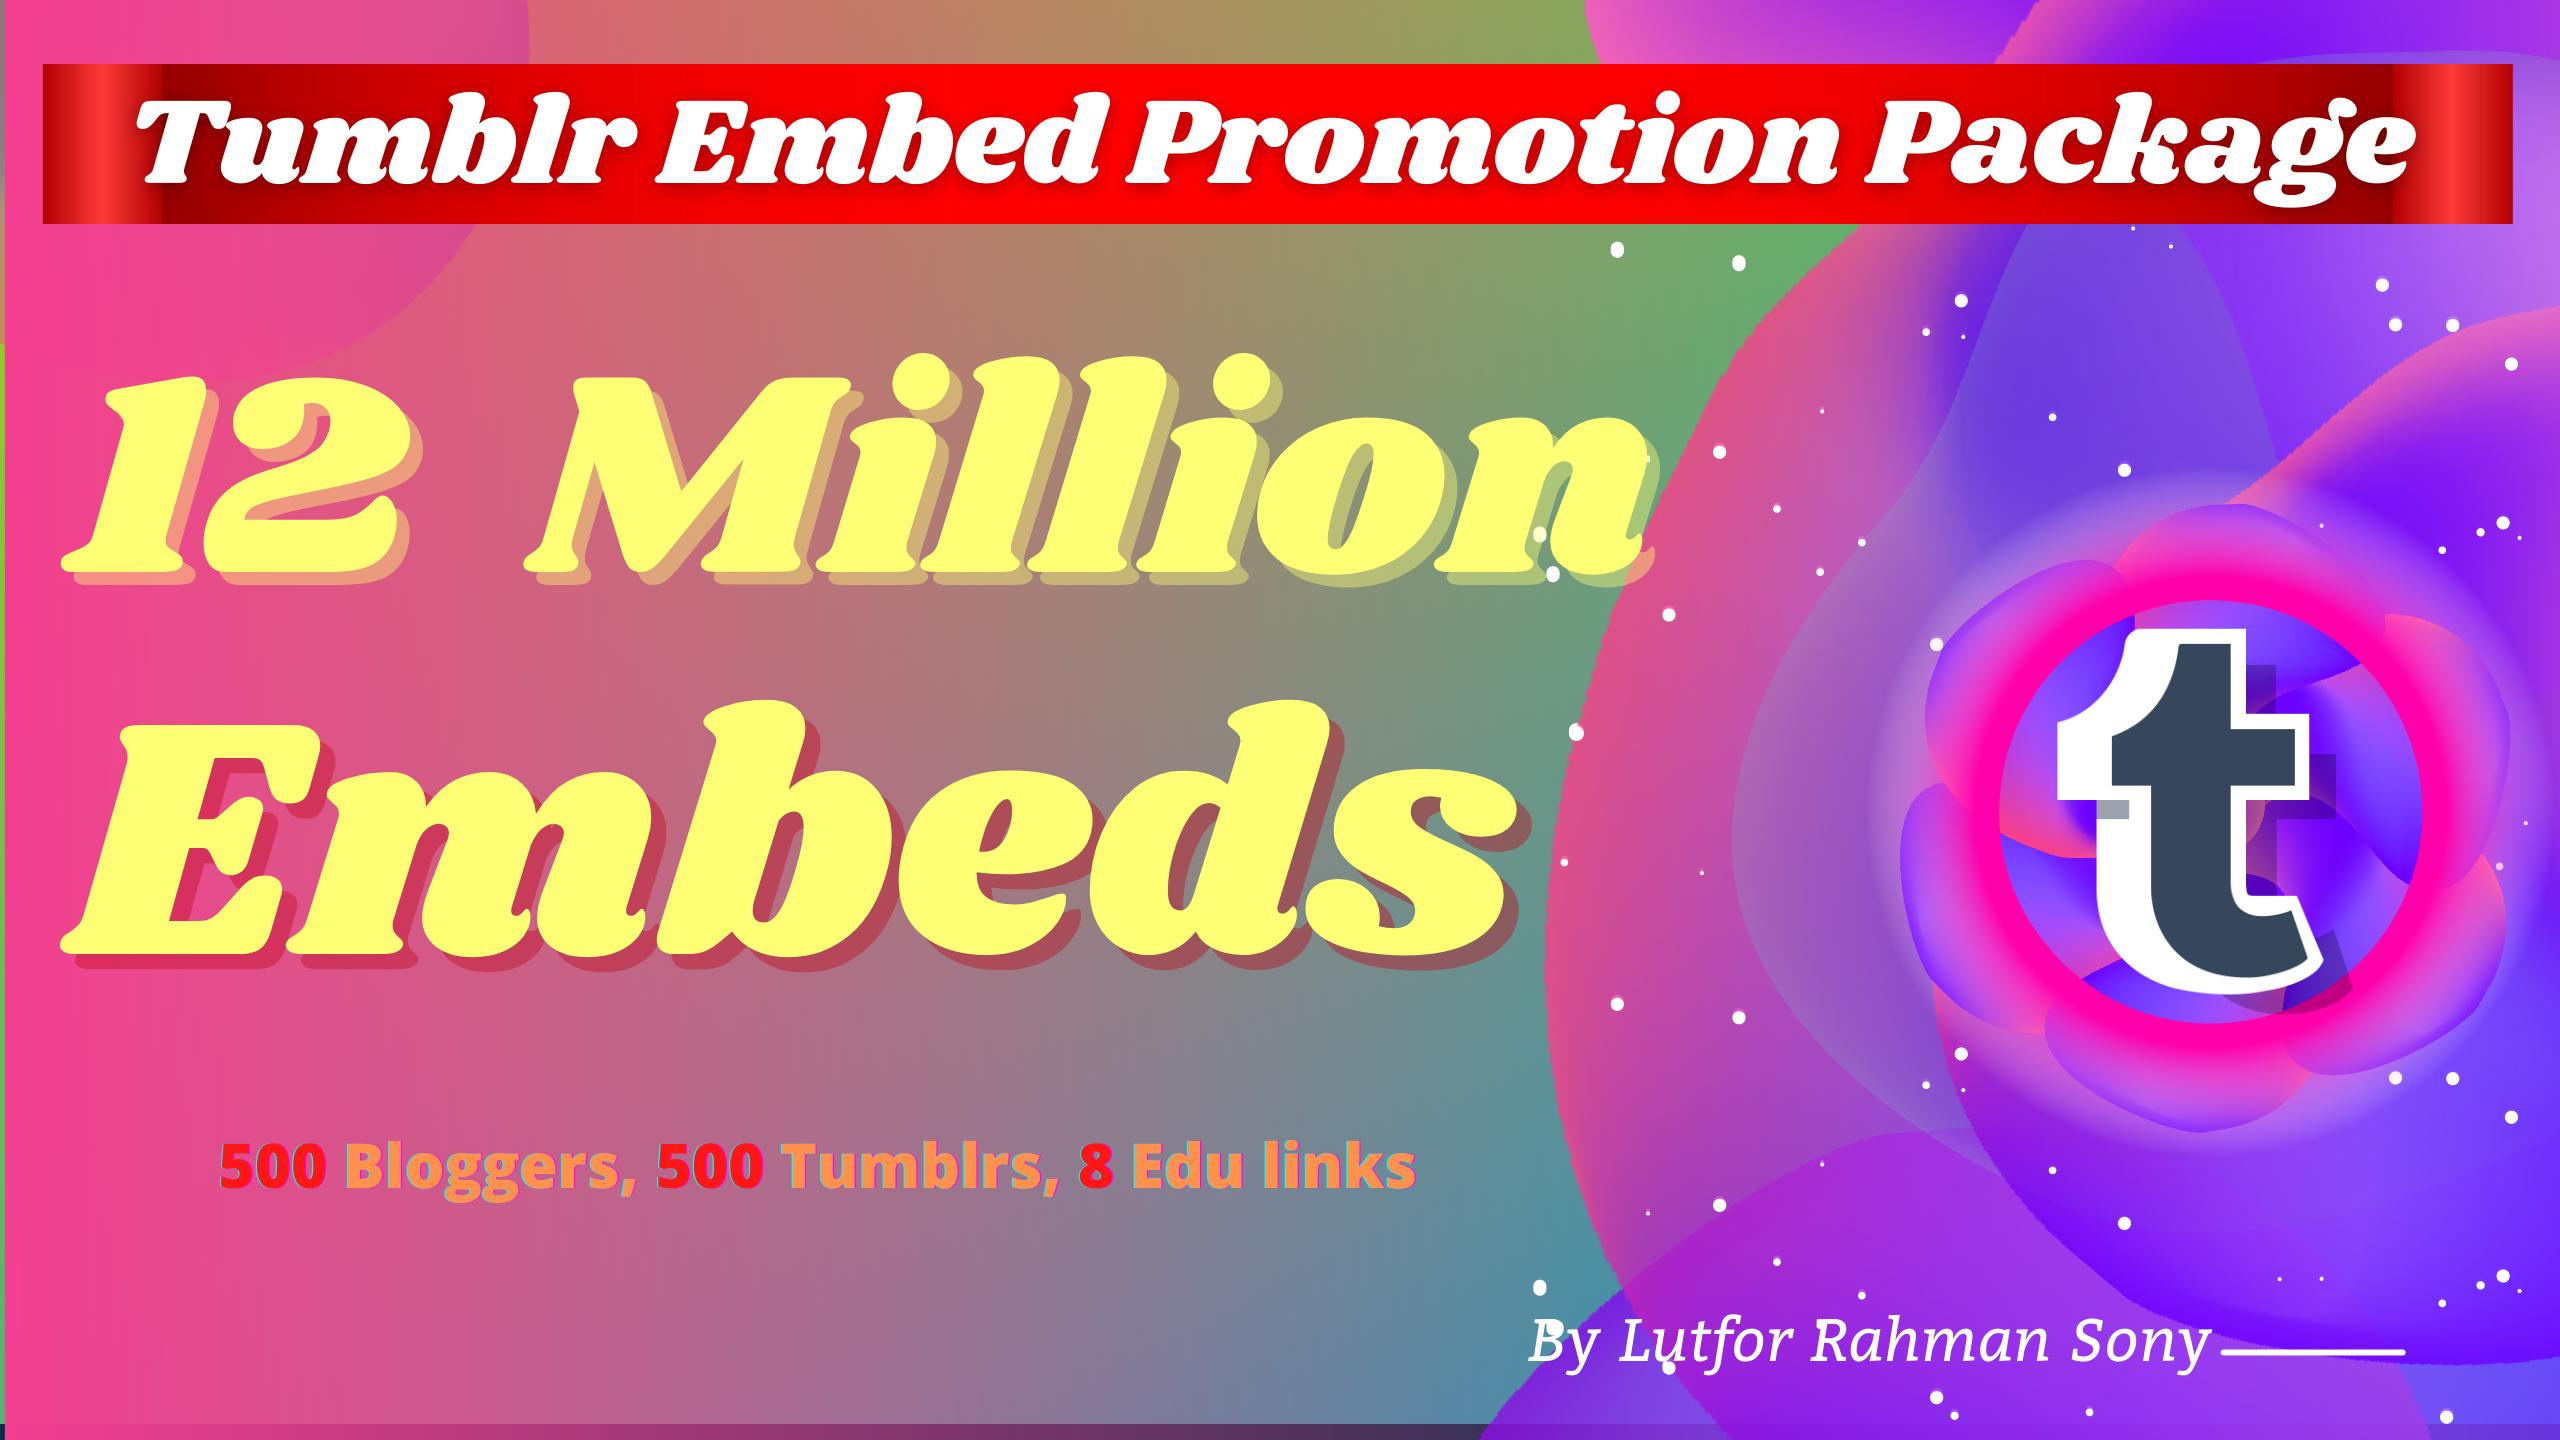 Tumblr marketing Tumblr Embed on 500 Blogger,  500 Tumblr, 12 Million Backlinks